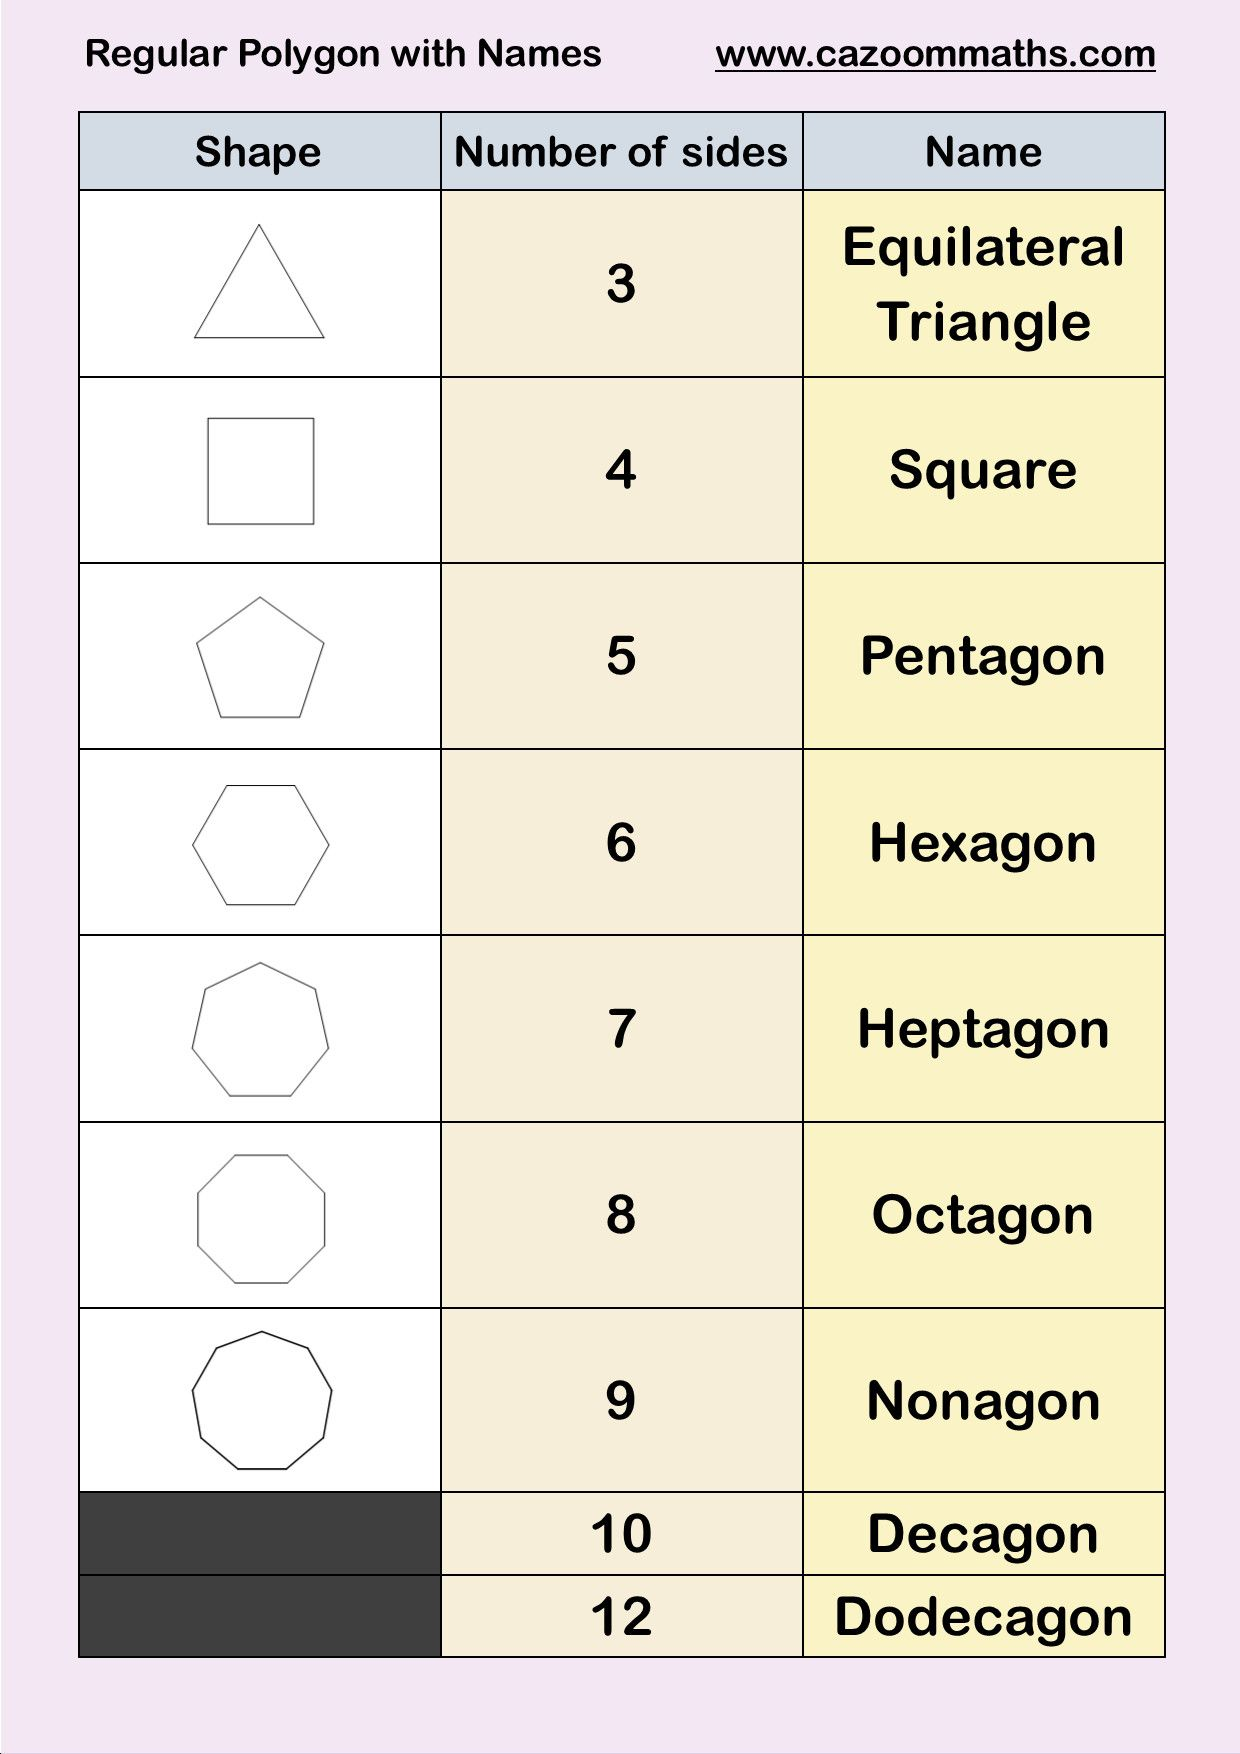 3 Properties Of Polygons Worksheet Polygon Name Chart Partanovations2019 In 2020 Naming Polygons Math Worksheet Geometry Worksheets